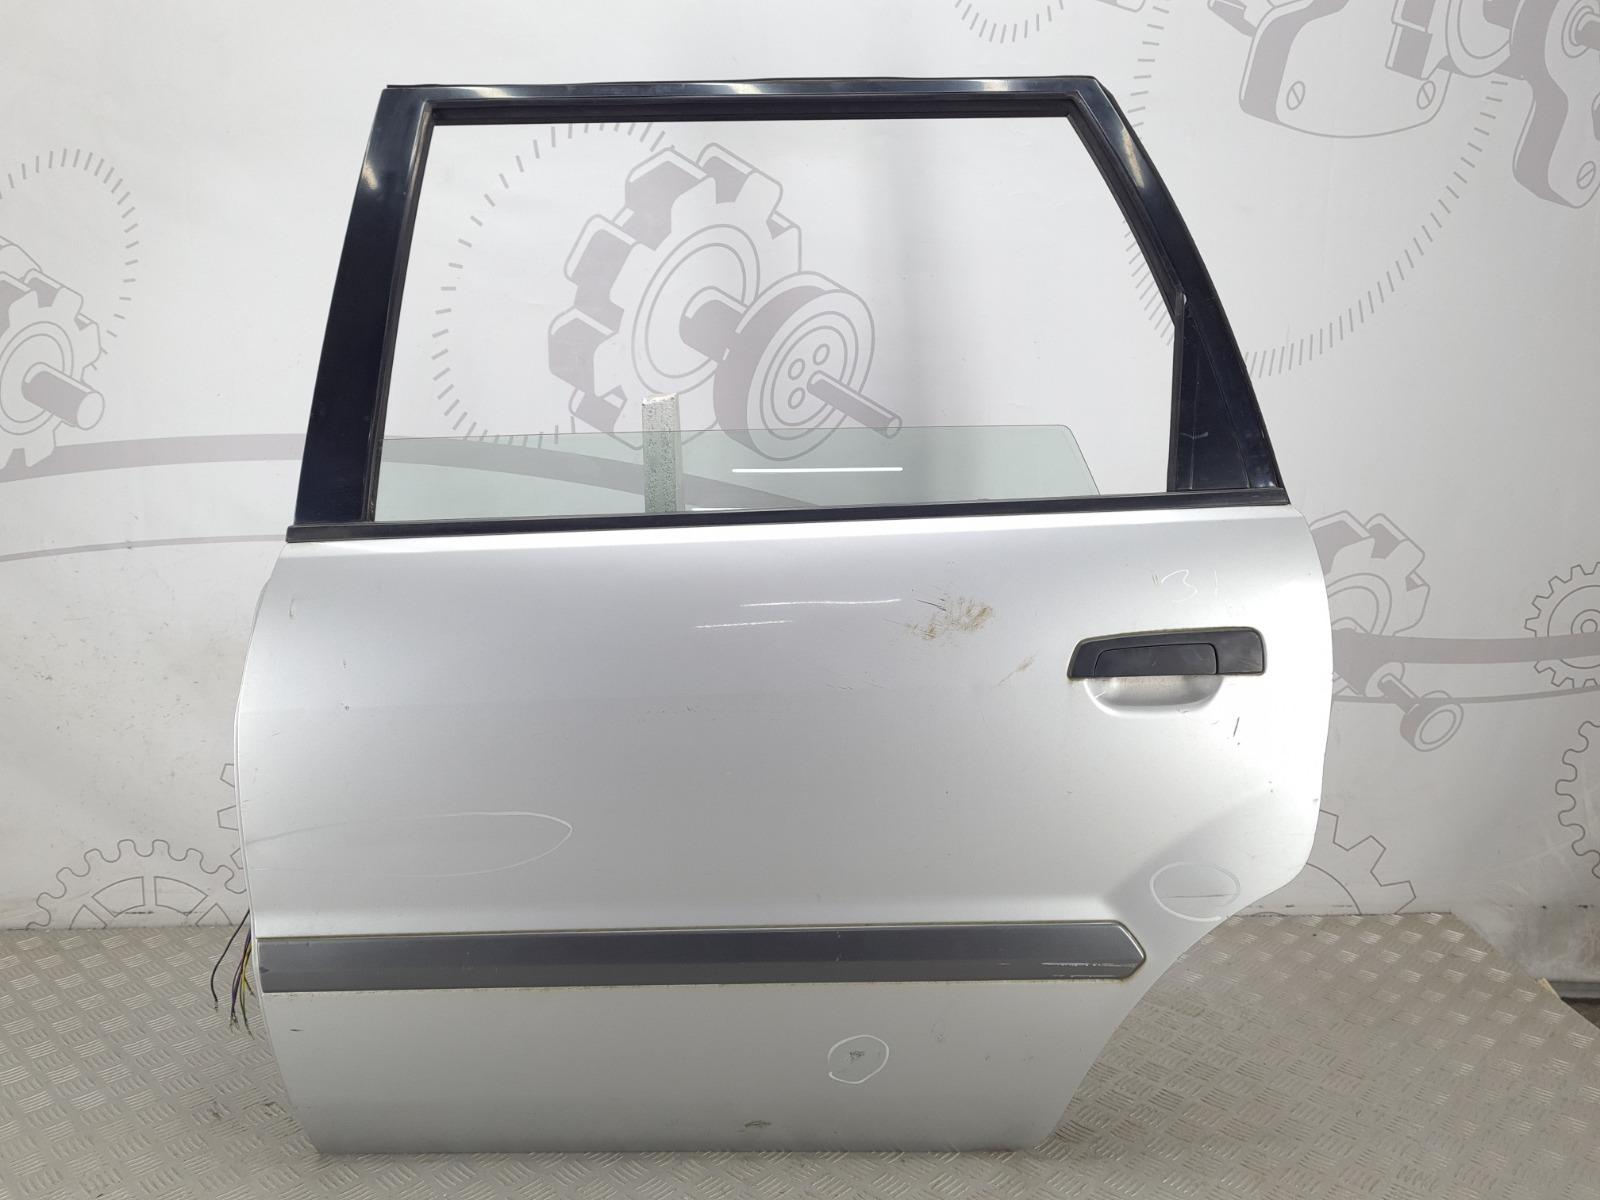 Дверь задняя левая Mitsubishi Space Wagon 3 2.4 I 2002 (б/у)